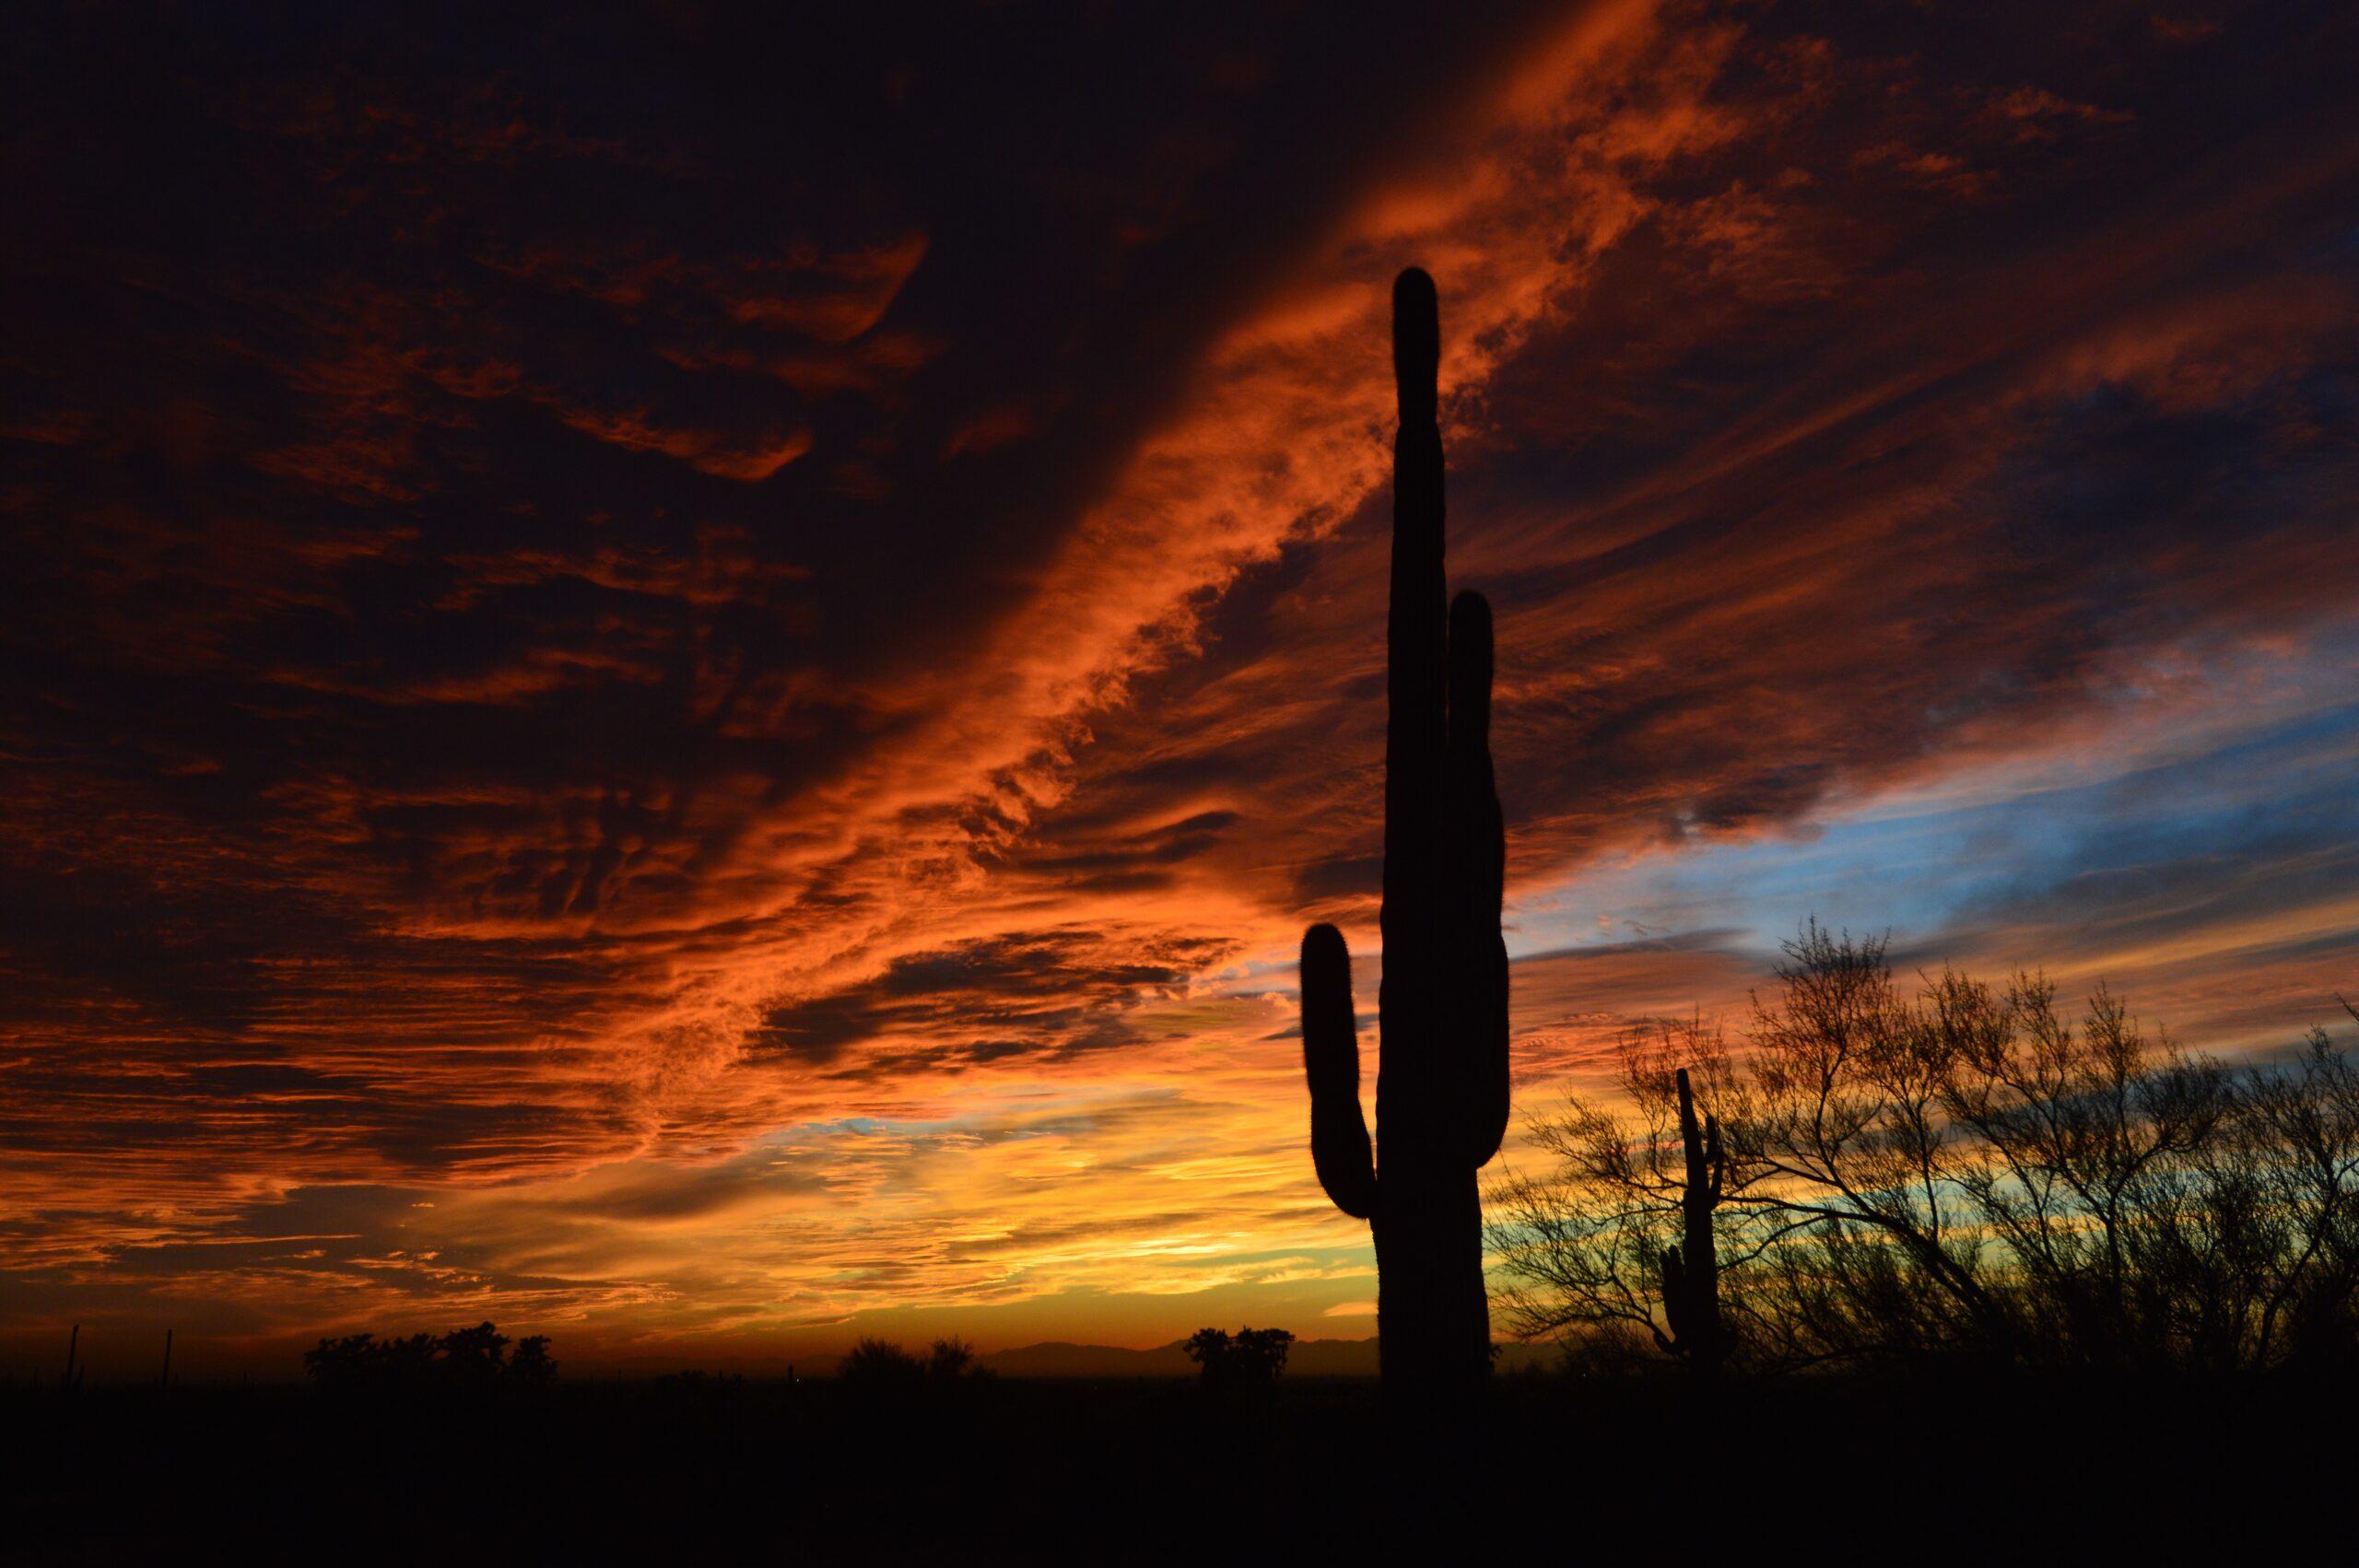 Arizona sunset near Phoenix, Arizona